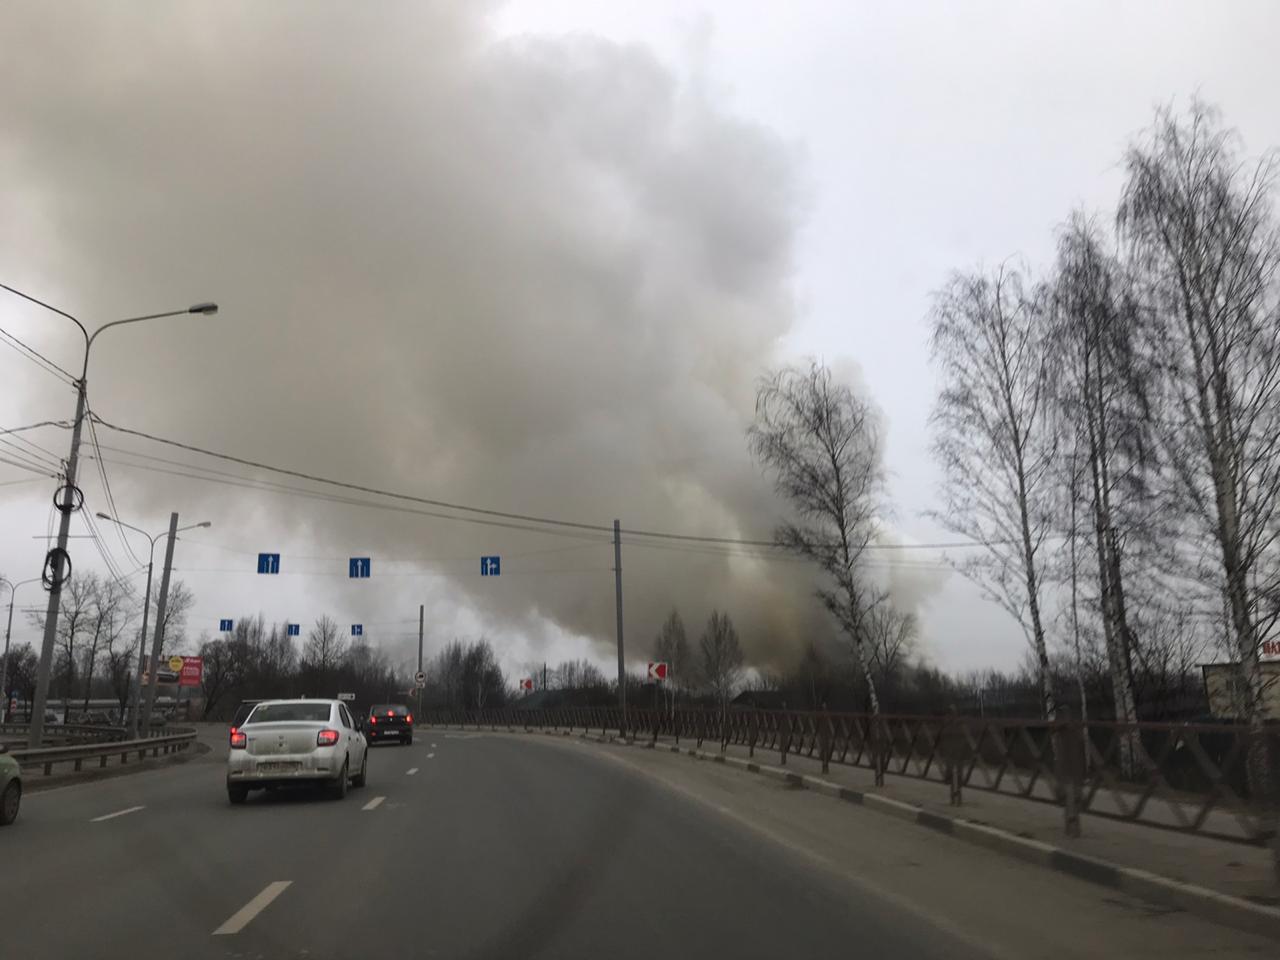 Над Ярославлем появился огромный столб дыма